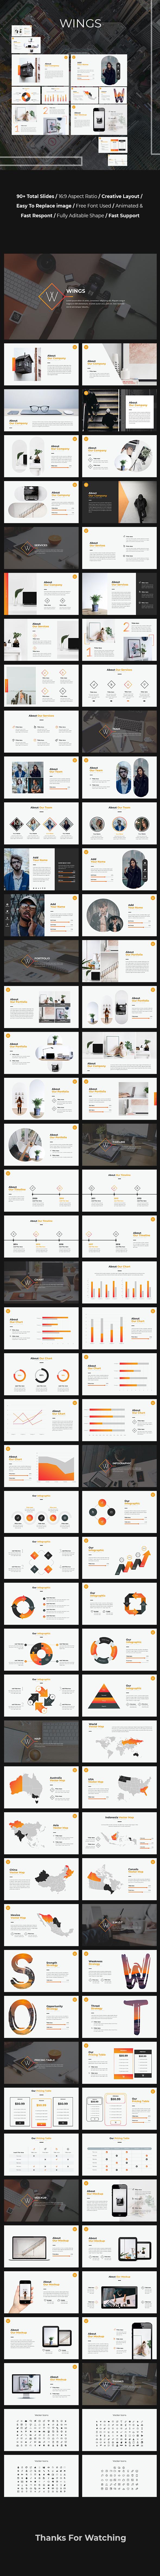 Wings Google Slides Template - Google Slides Presentation Templates